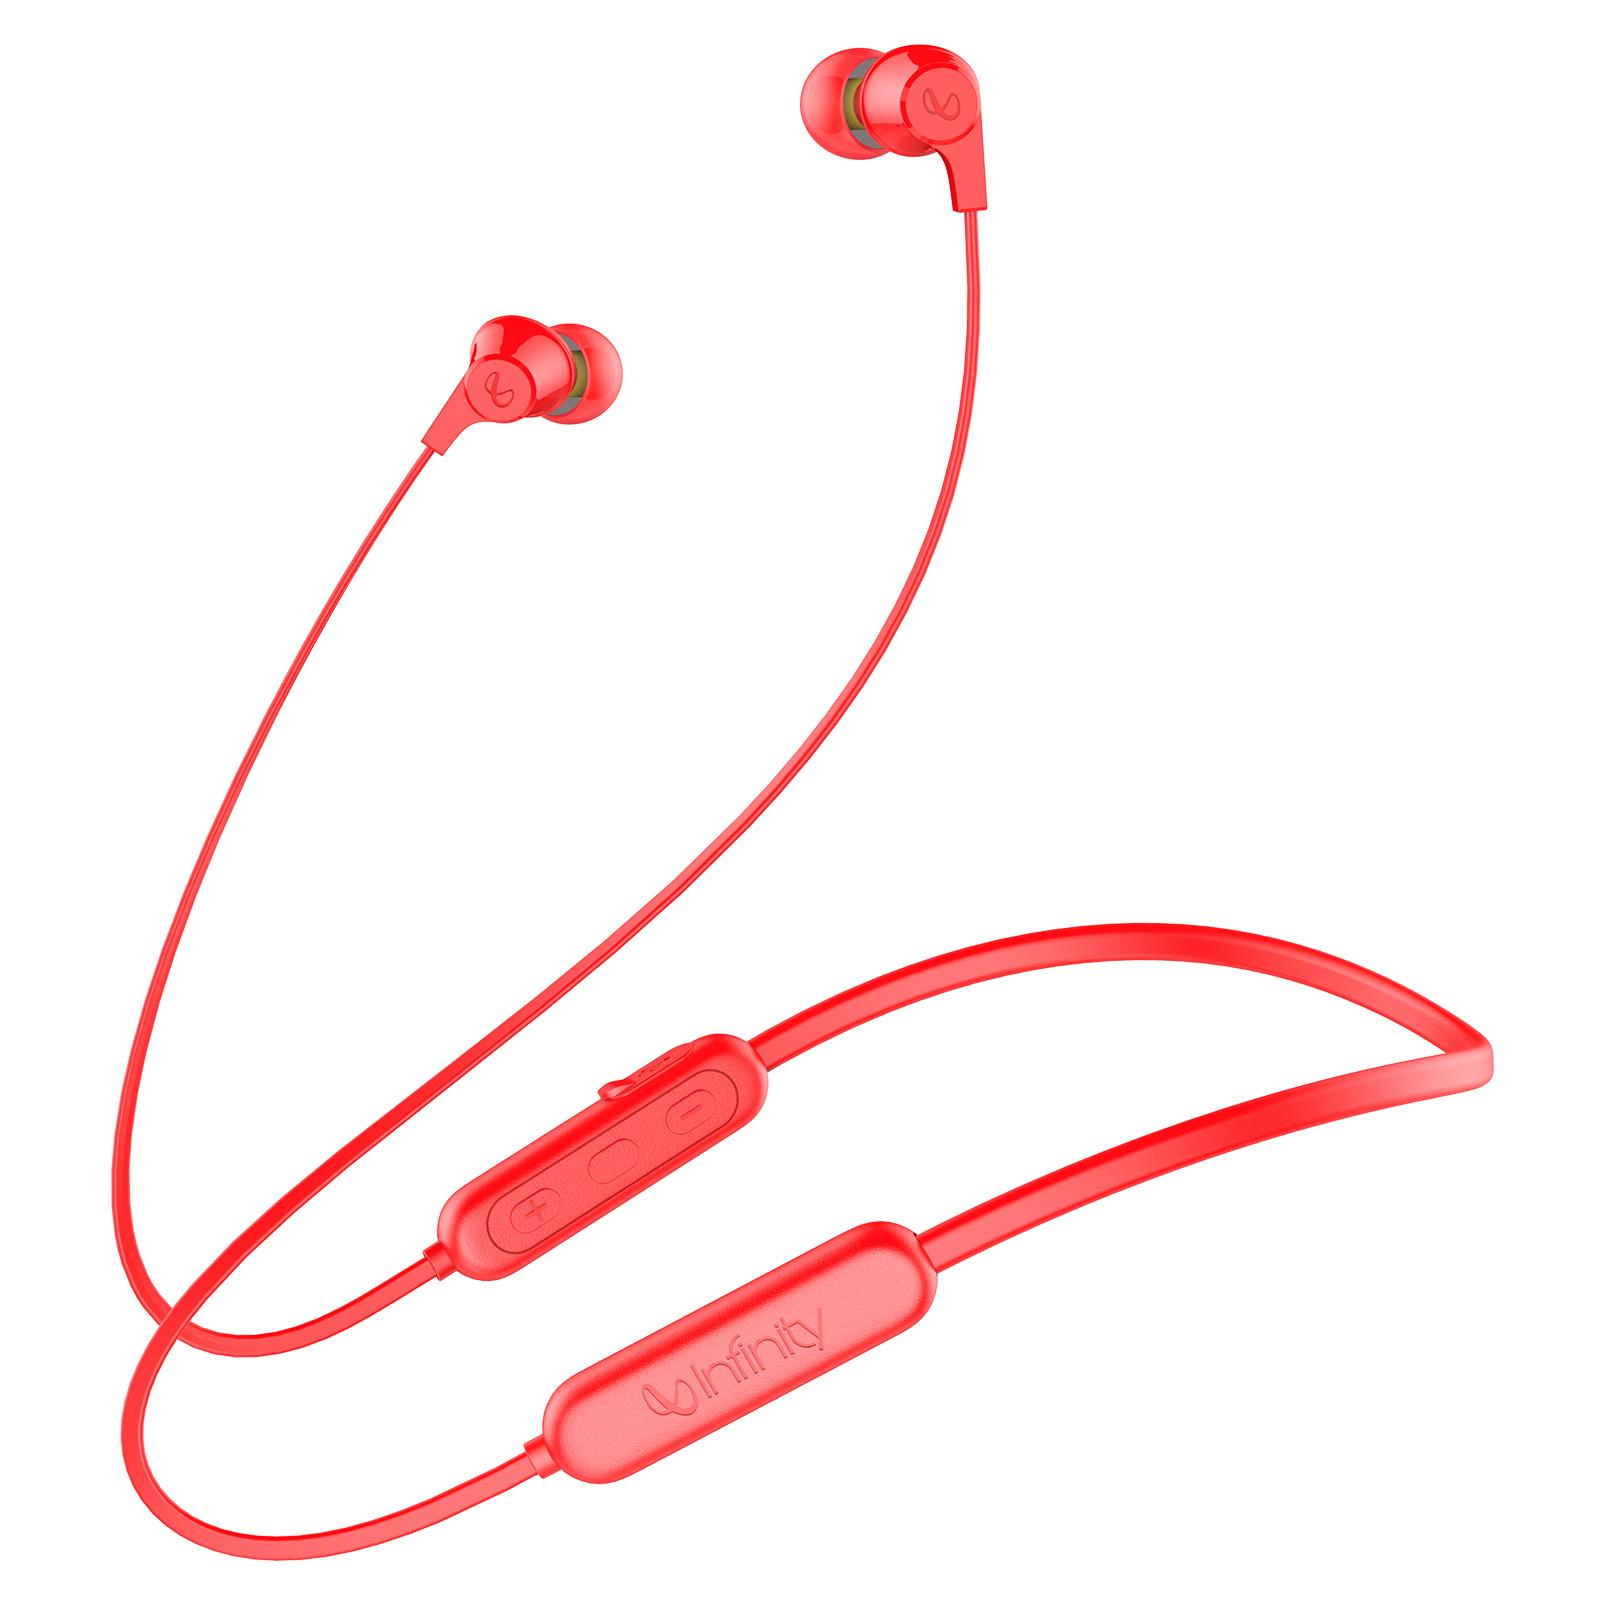 INFINITY GLIDE N100 - Red - In-Ear Ultra Light Neckband - Hero